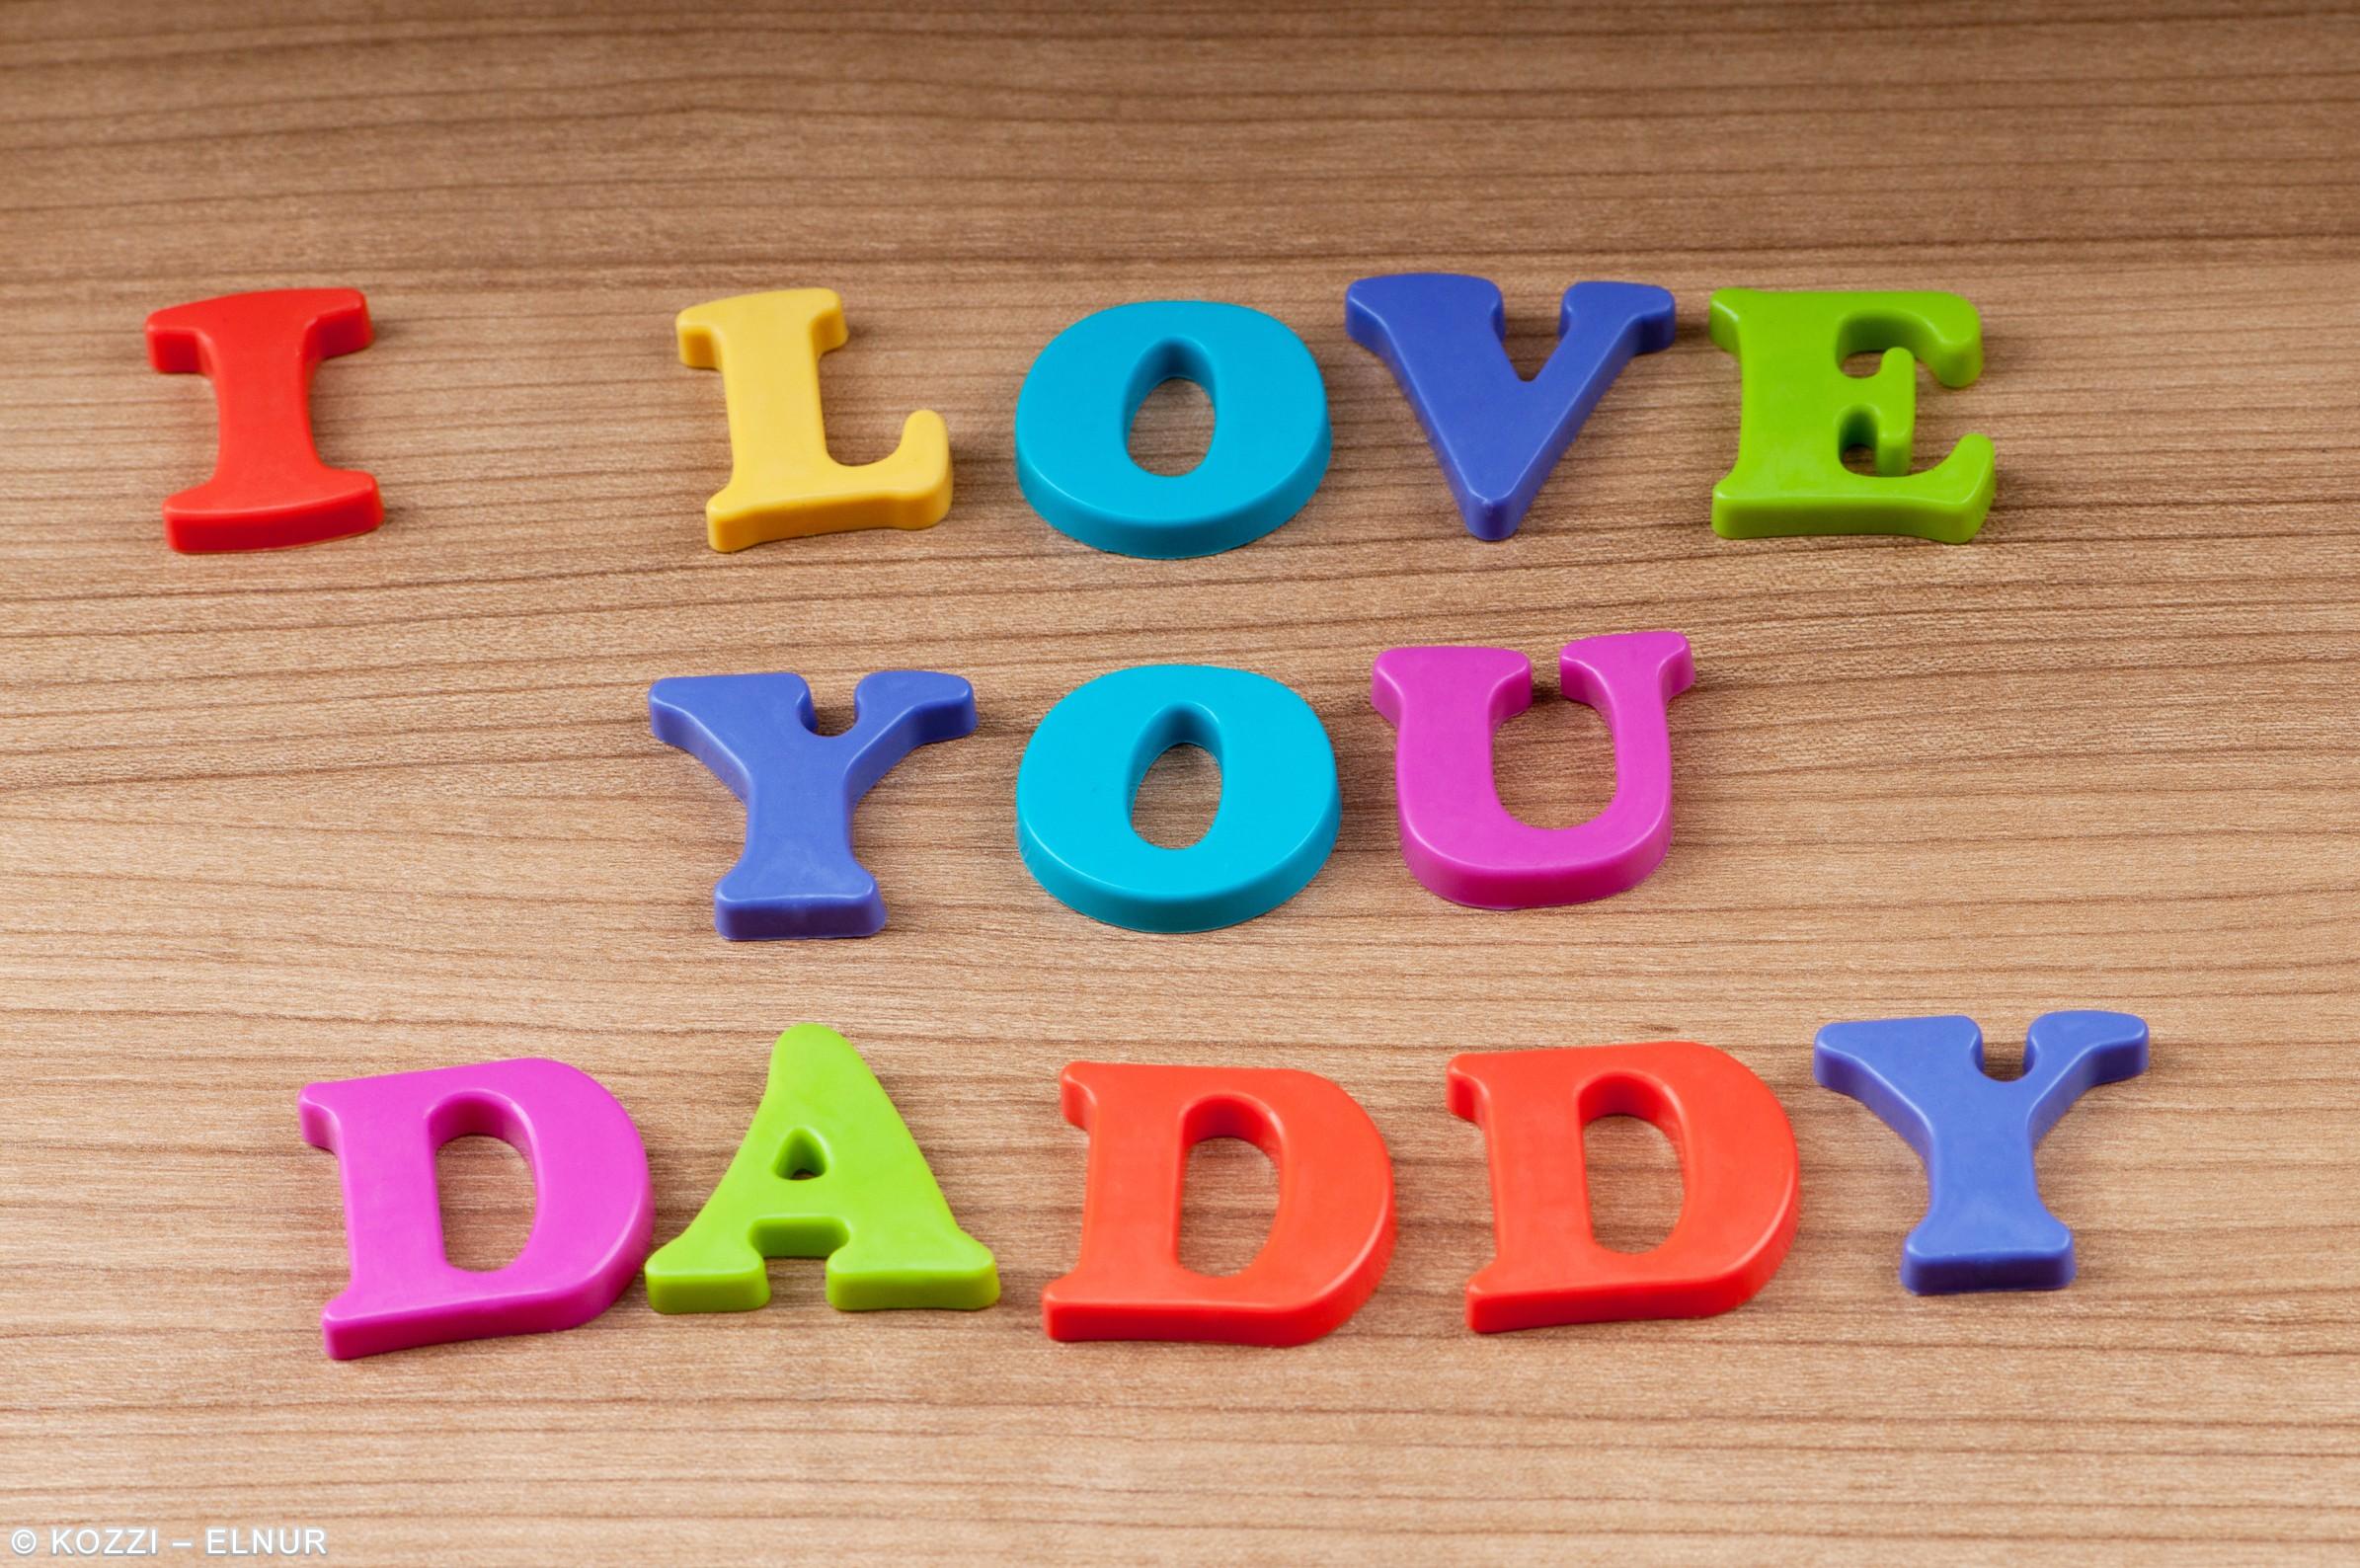 Love You Papa Hd Wallpaper : I Love You Daddy Wallpaper - WallpaperSafari